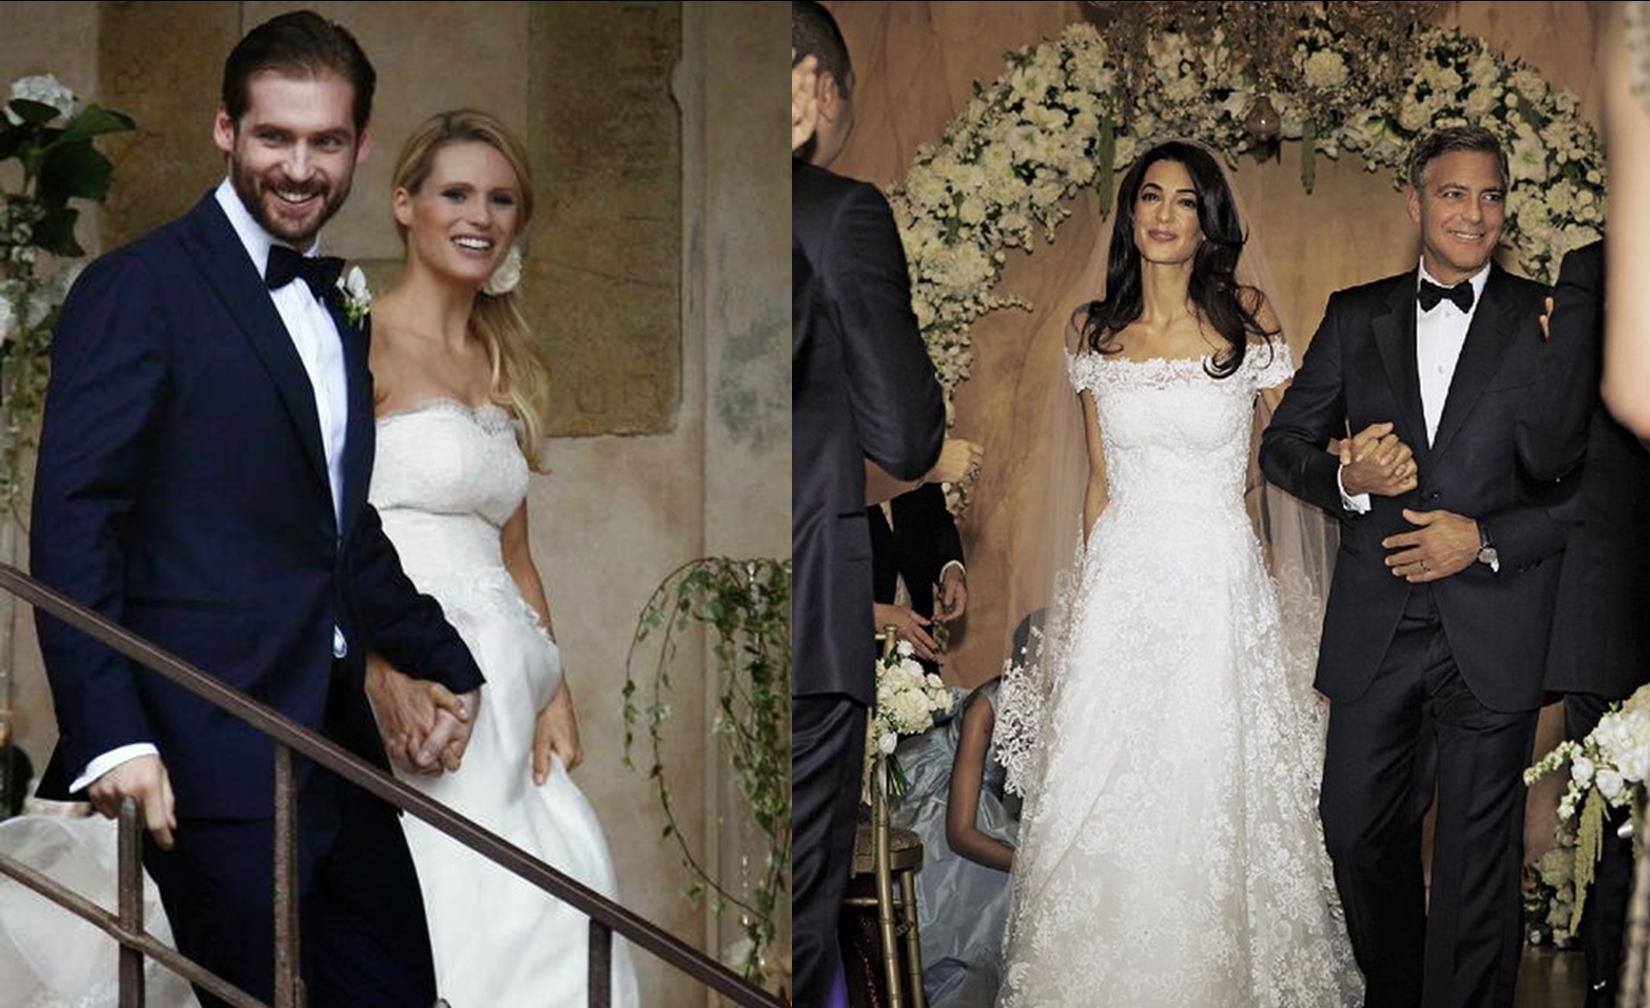 Matrimoni vip: Michelle Hunziker e Tomaso Trussardi; Amal Alamuddin e George Clooney